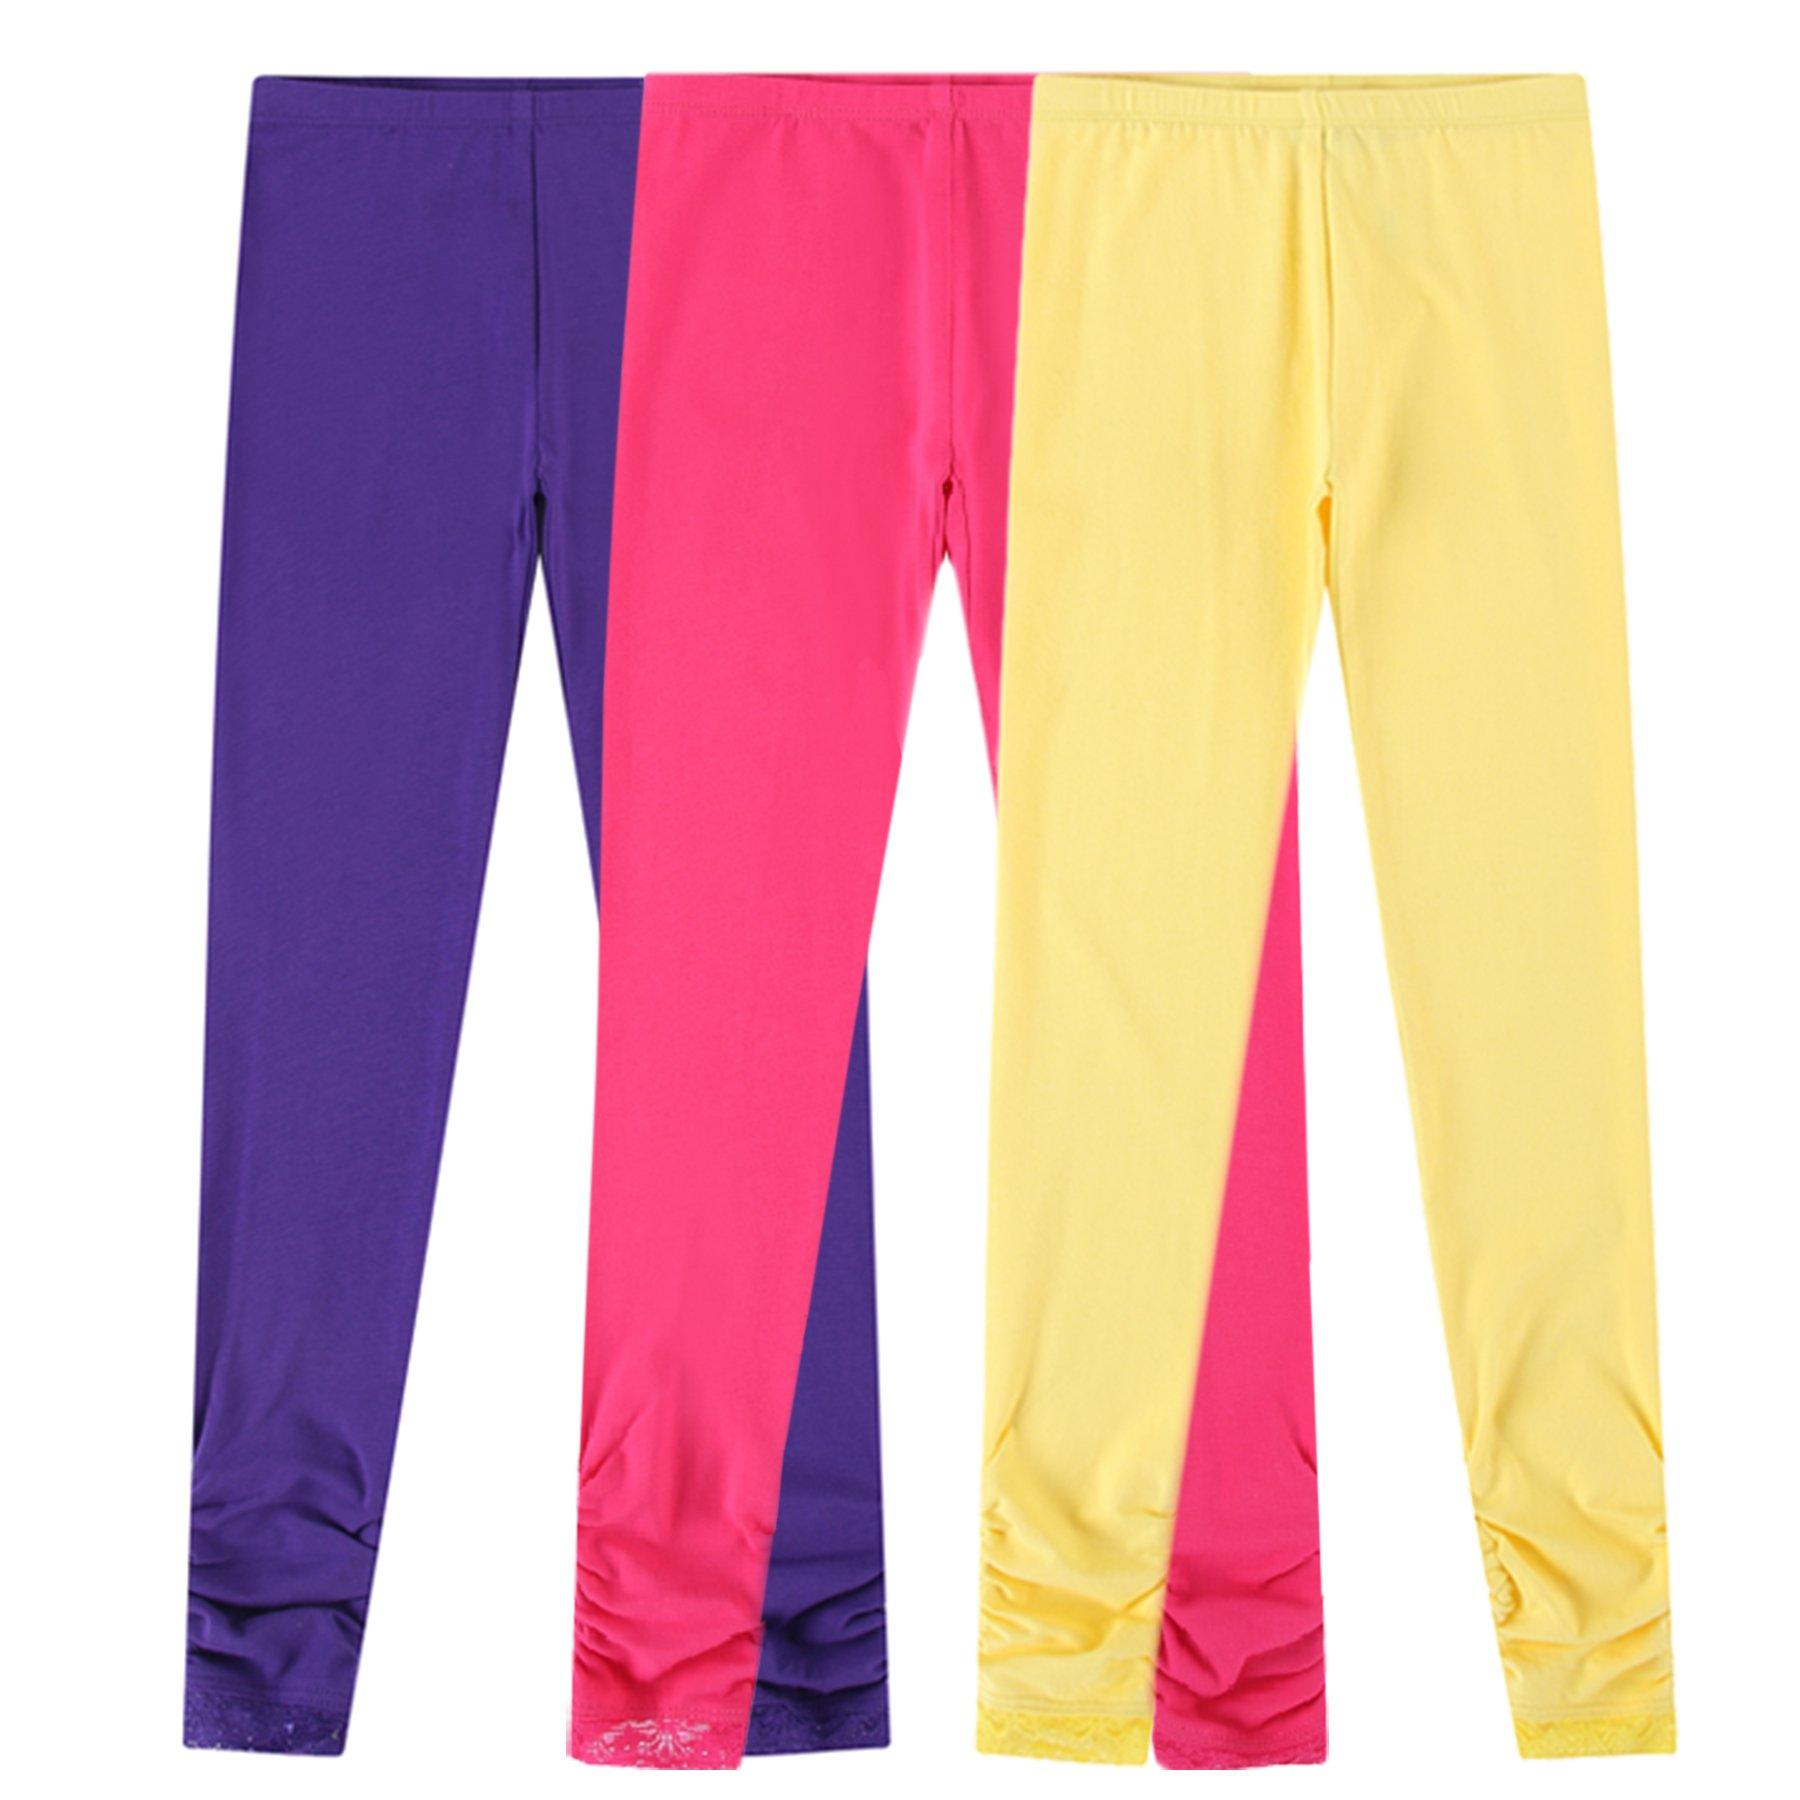 Bienzoe Girl's Knit Cotton Stretch School Uniform Lace Antistatic Legging 3 Pack Lt Size 6 Rose/Purple/Yellow